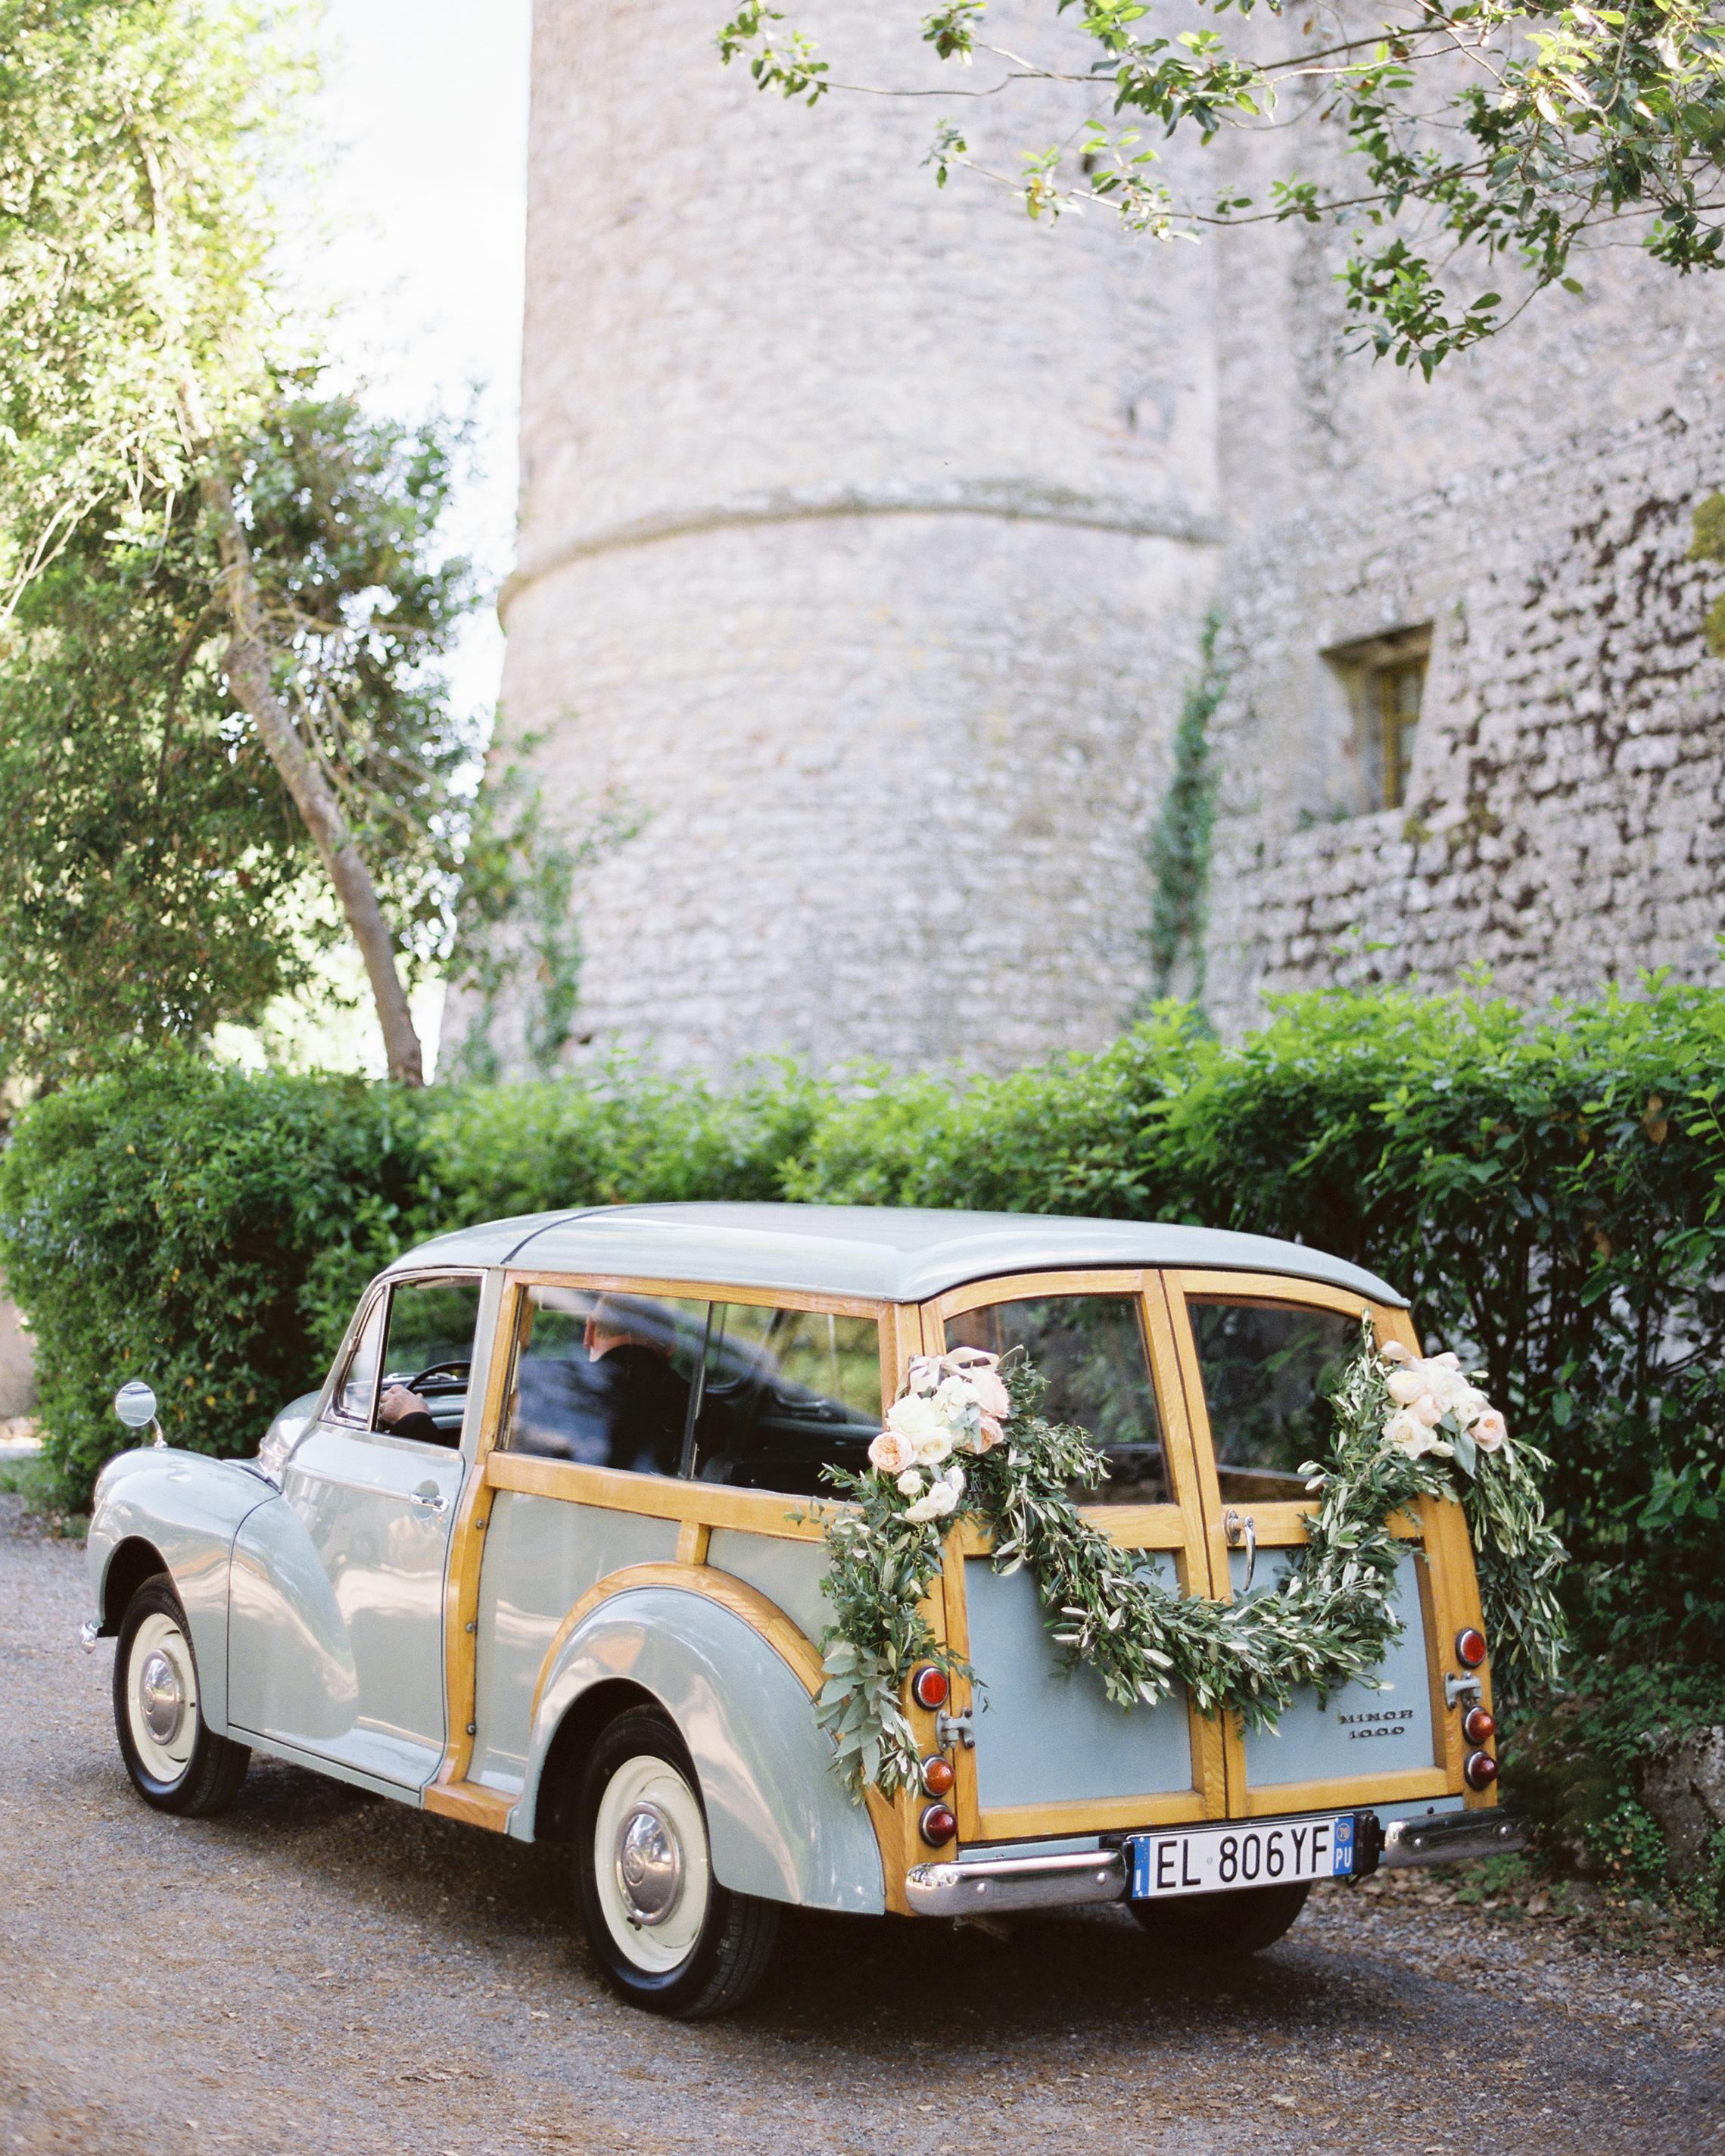 lauren-ollie-wedding-car-163-s111895-0515.jpg